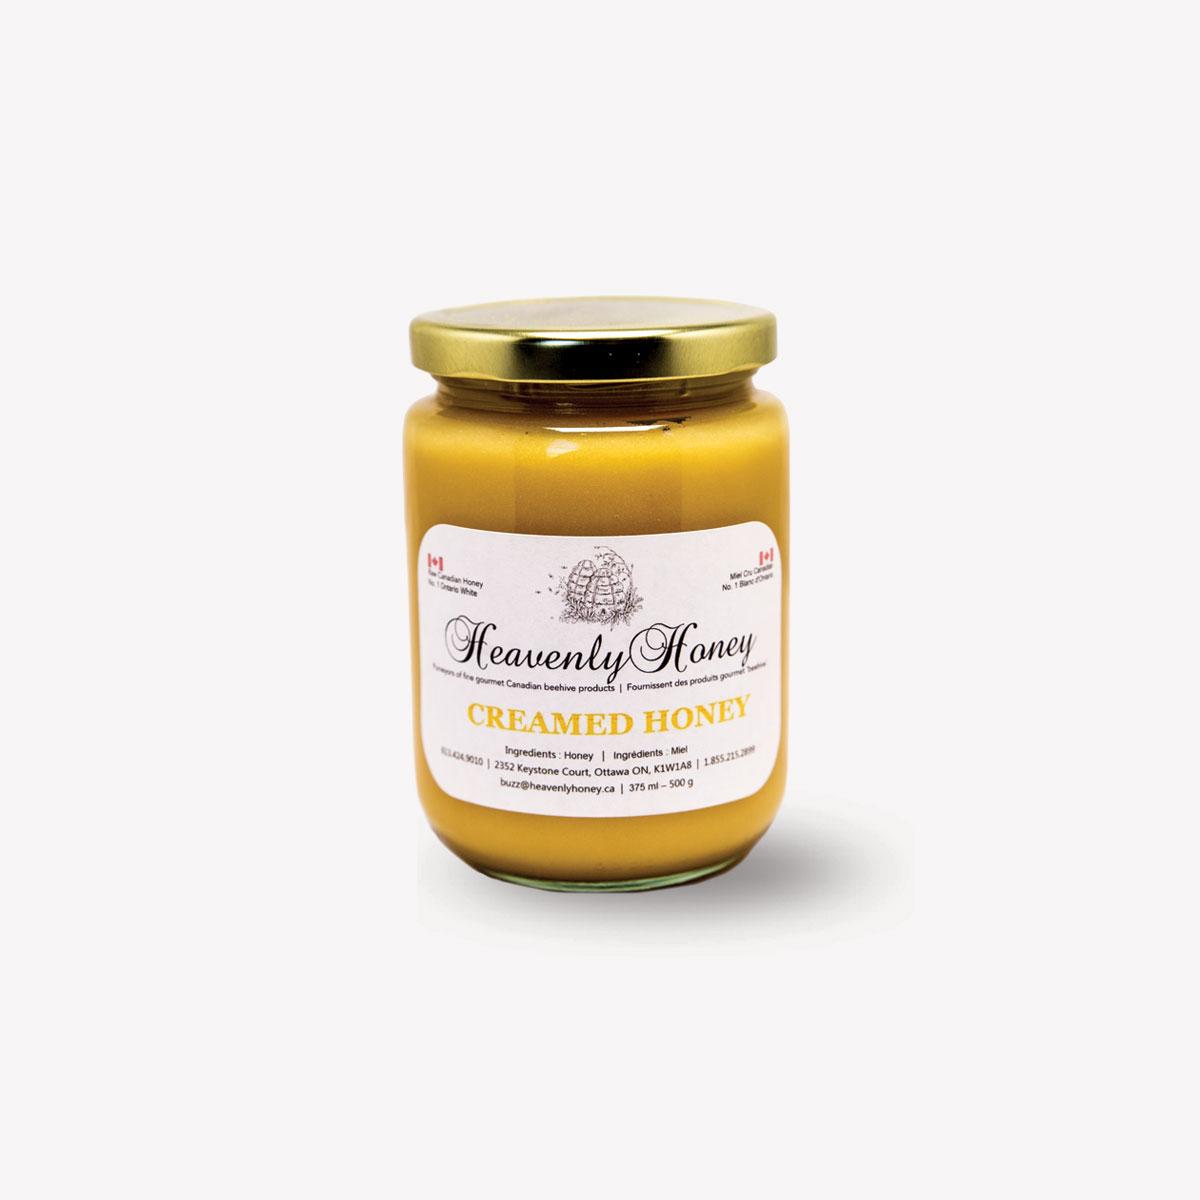 Heavenly Honey Creamed Honey